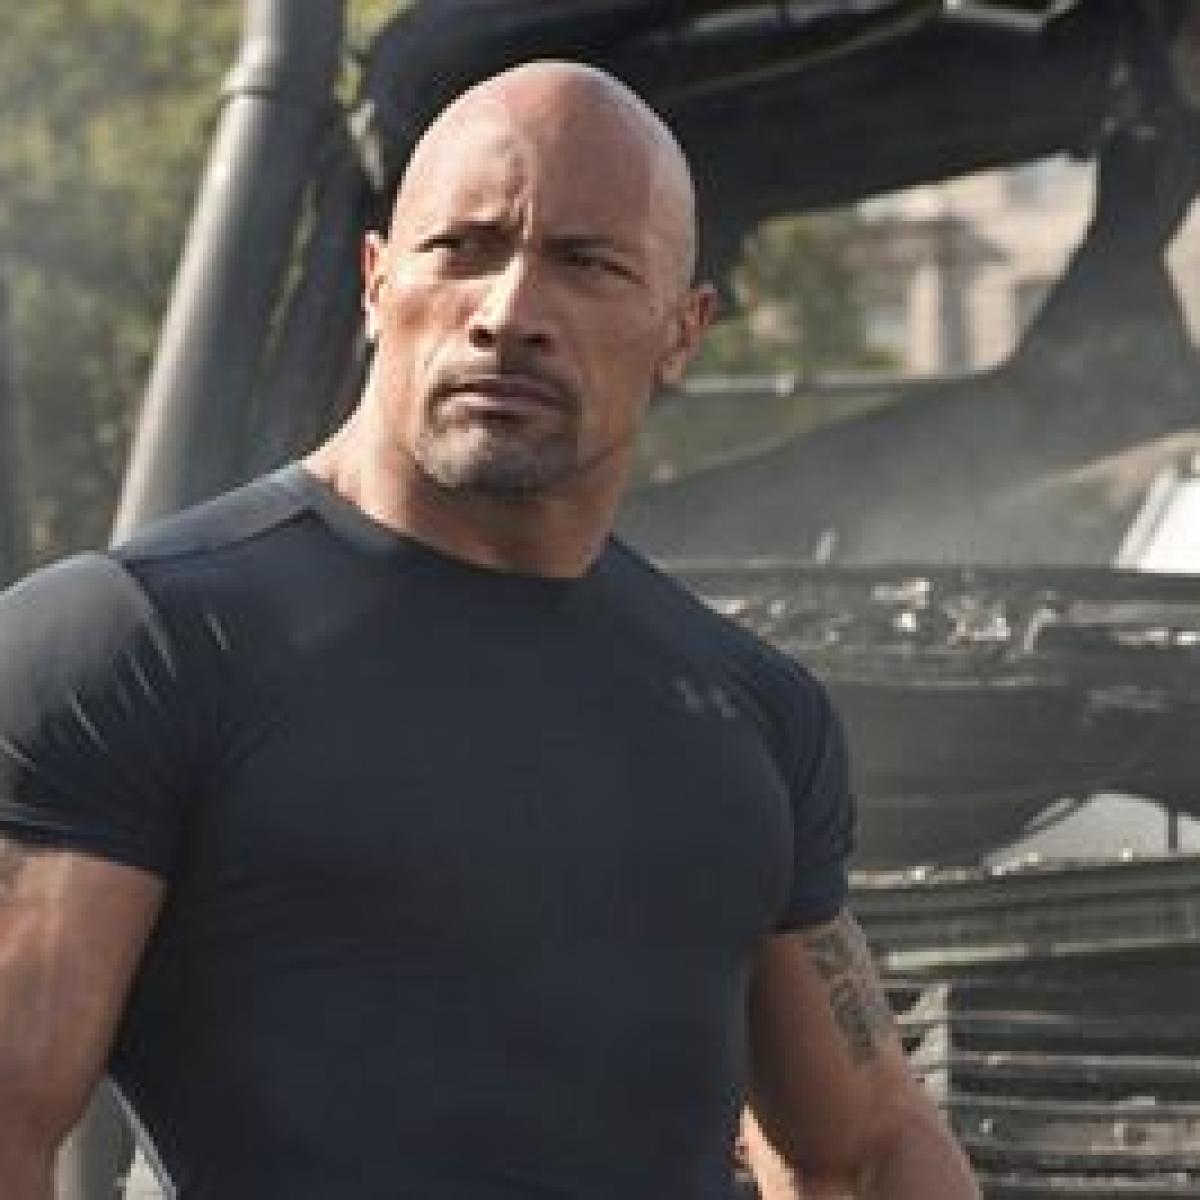 Dwayne Johnson's 'Black Adam' to release in Dec 2021